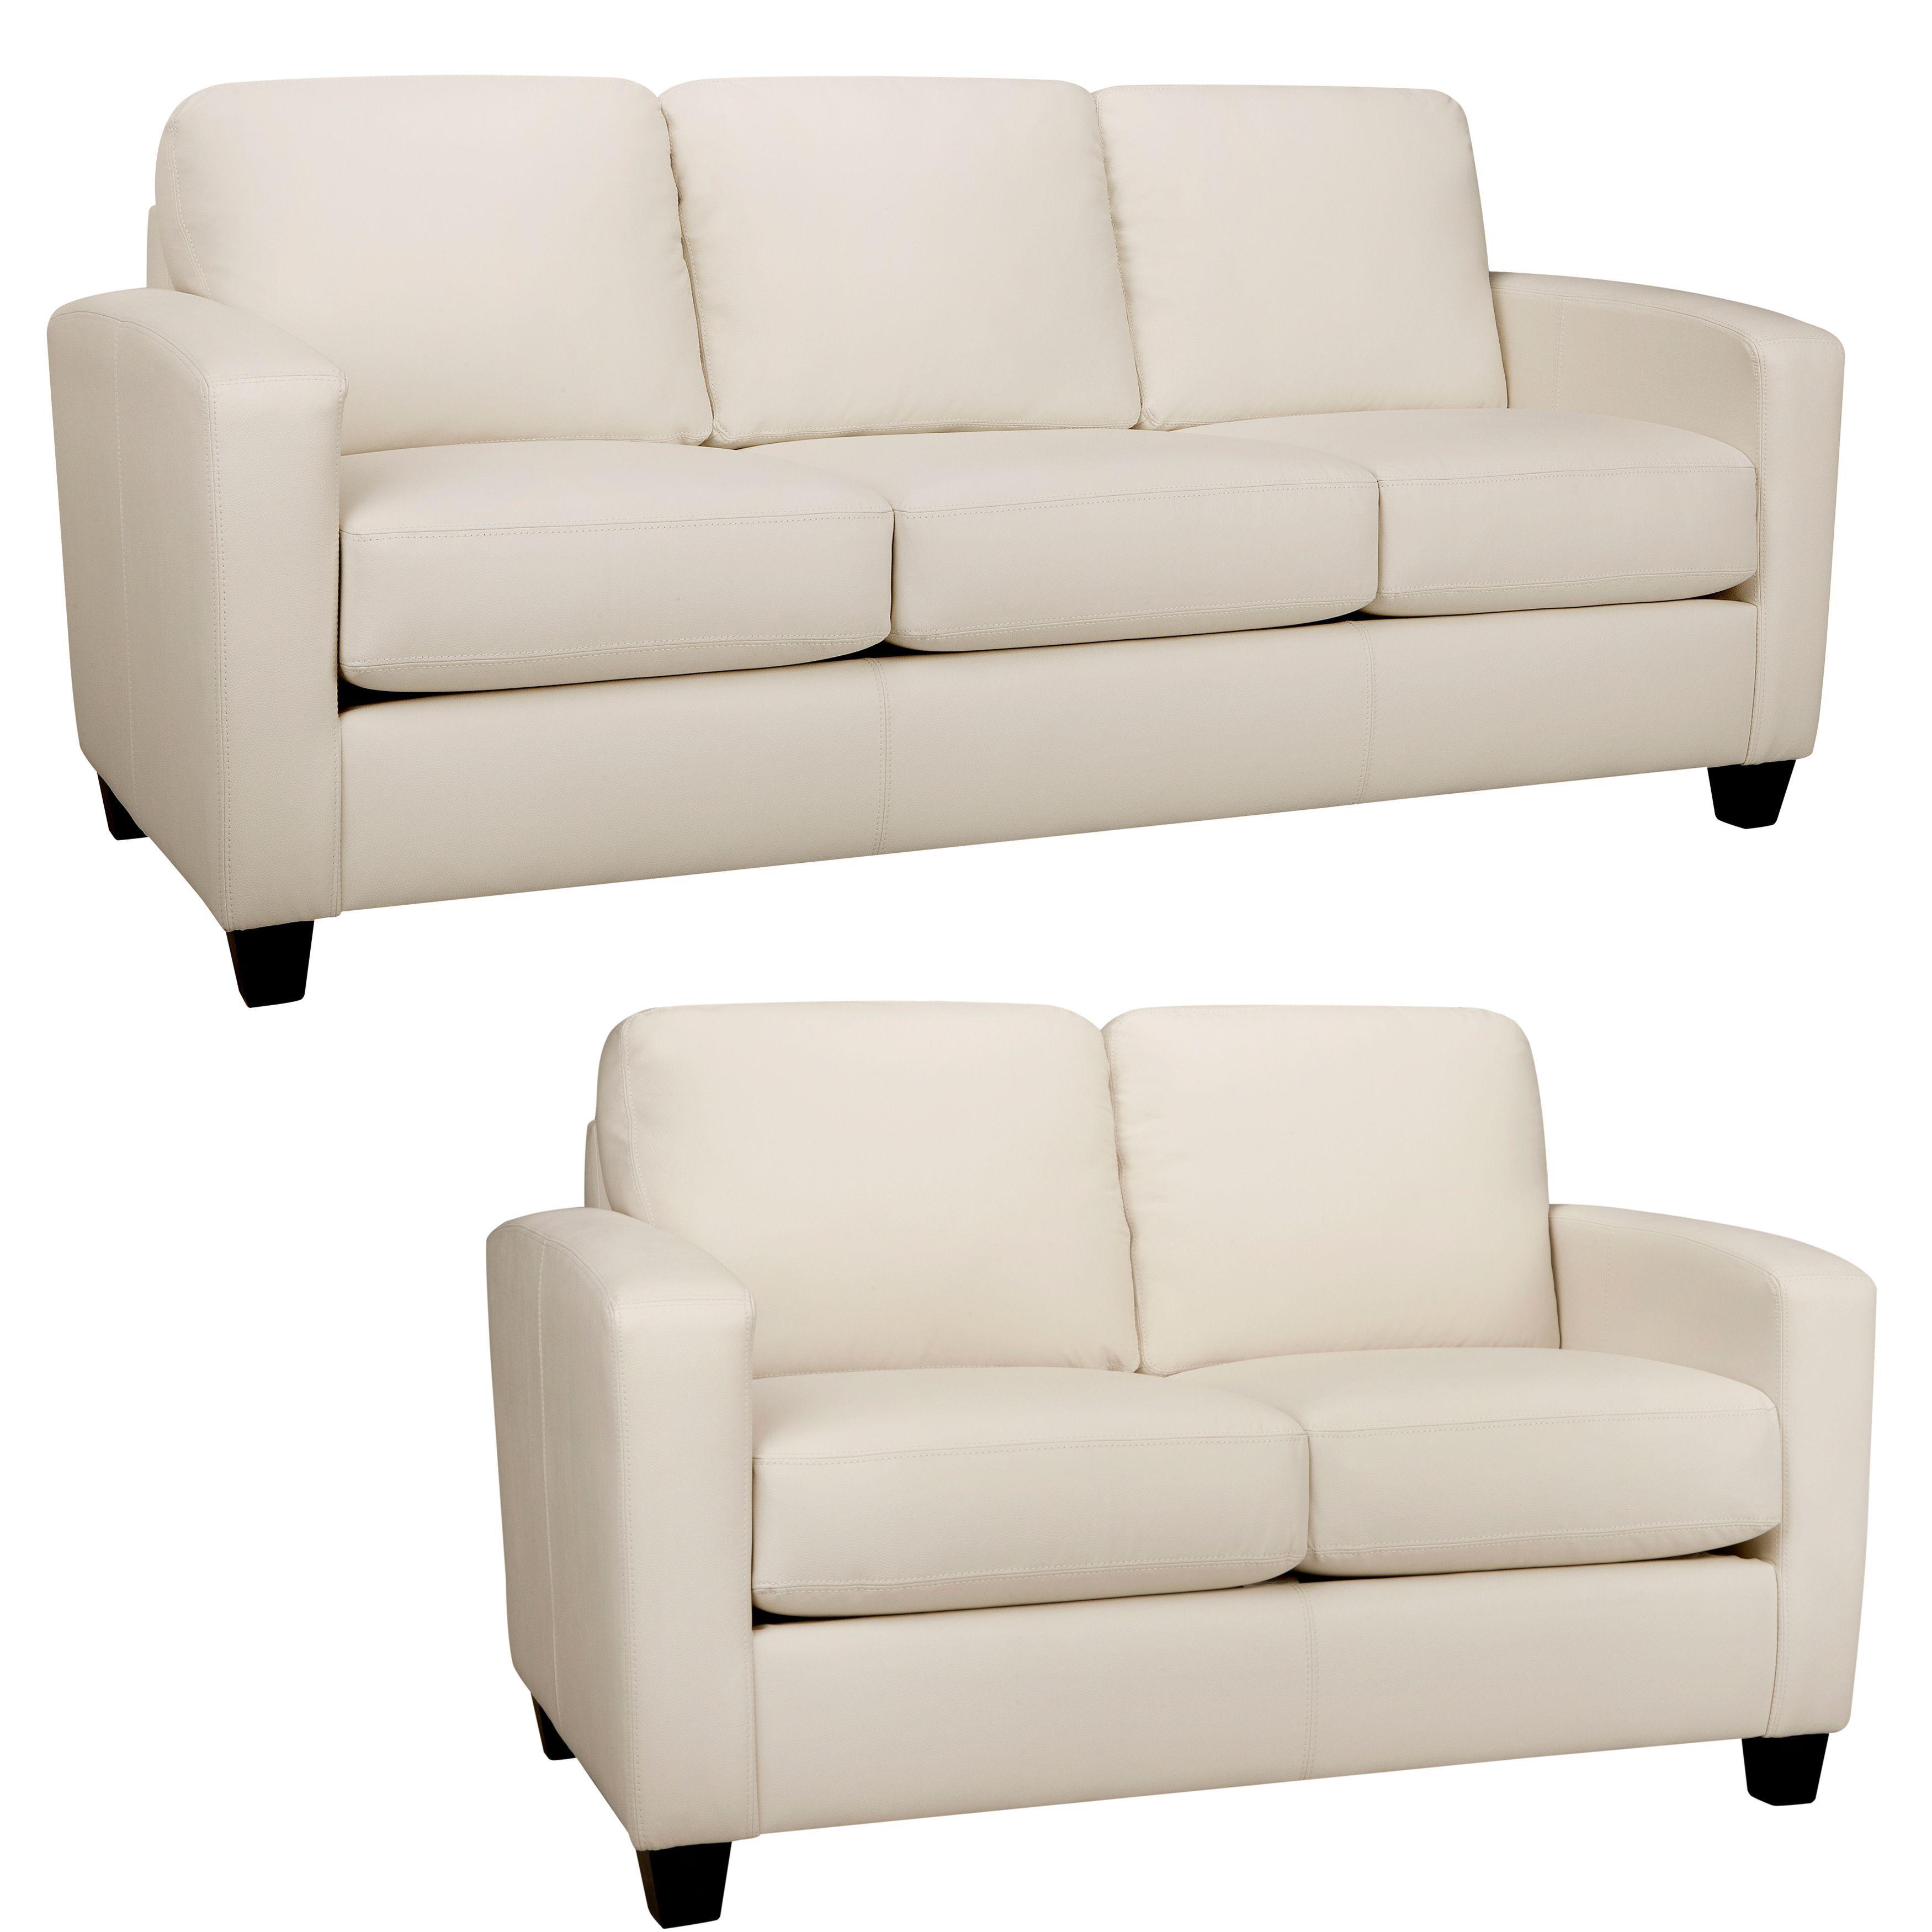 Online Shopping Bedding Furniture Electronics Jewelry Clothing More White Leather Sofas Leather Sofa Loveseat Italian Leather Sofa